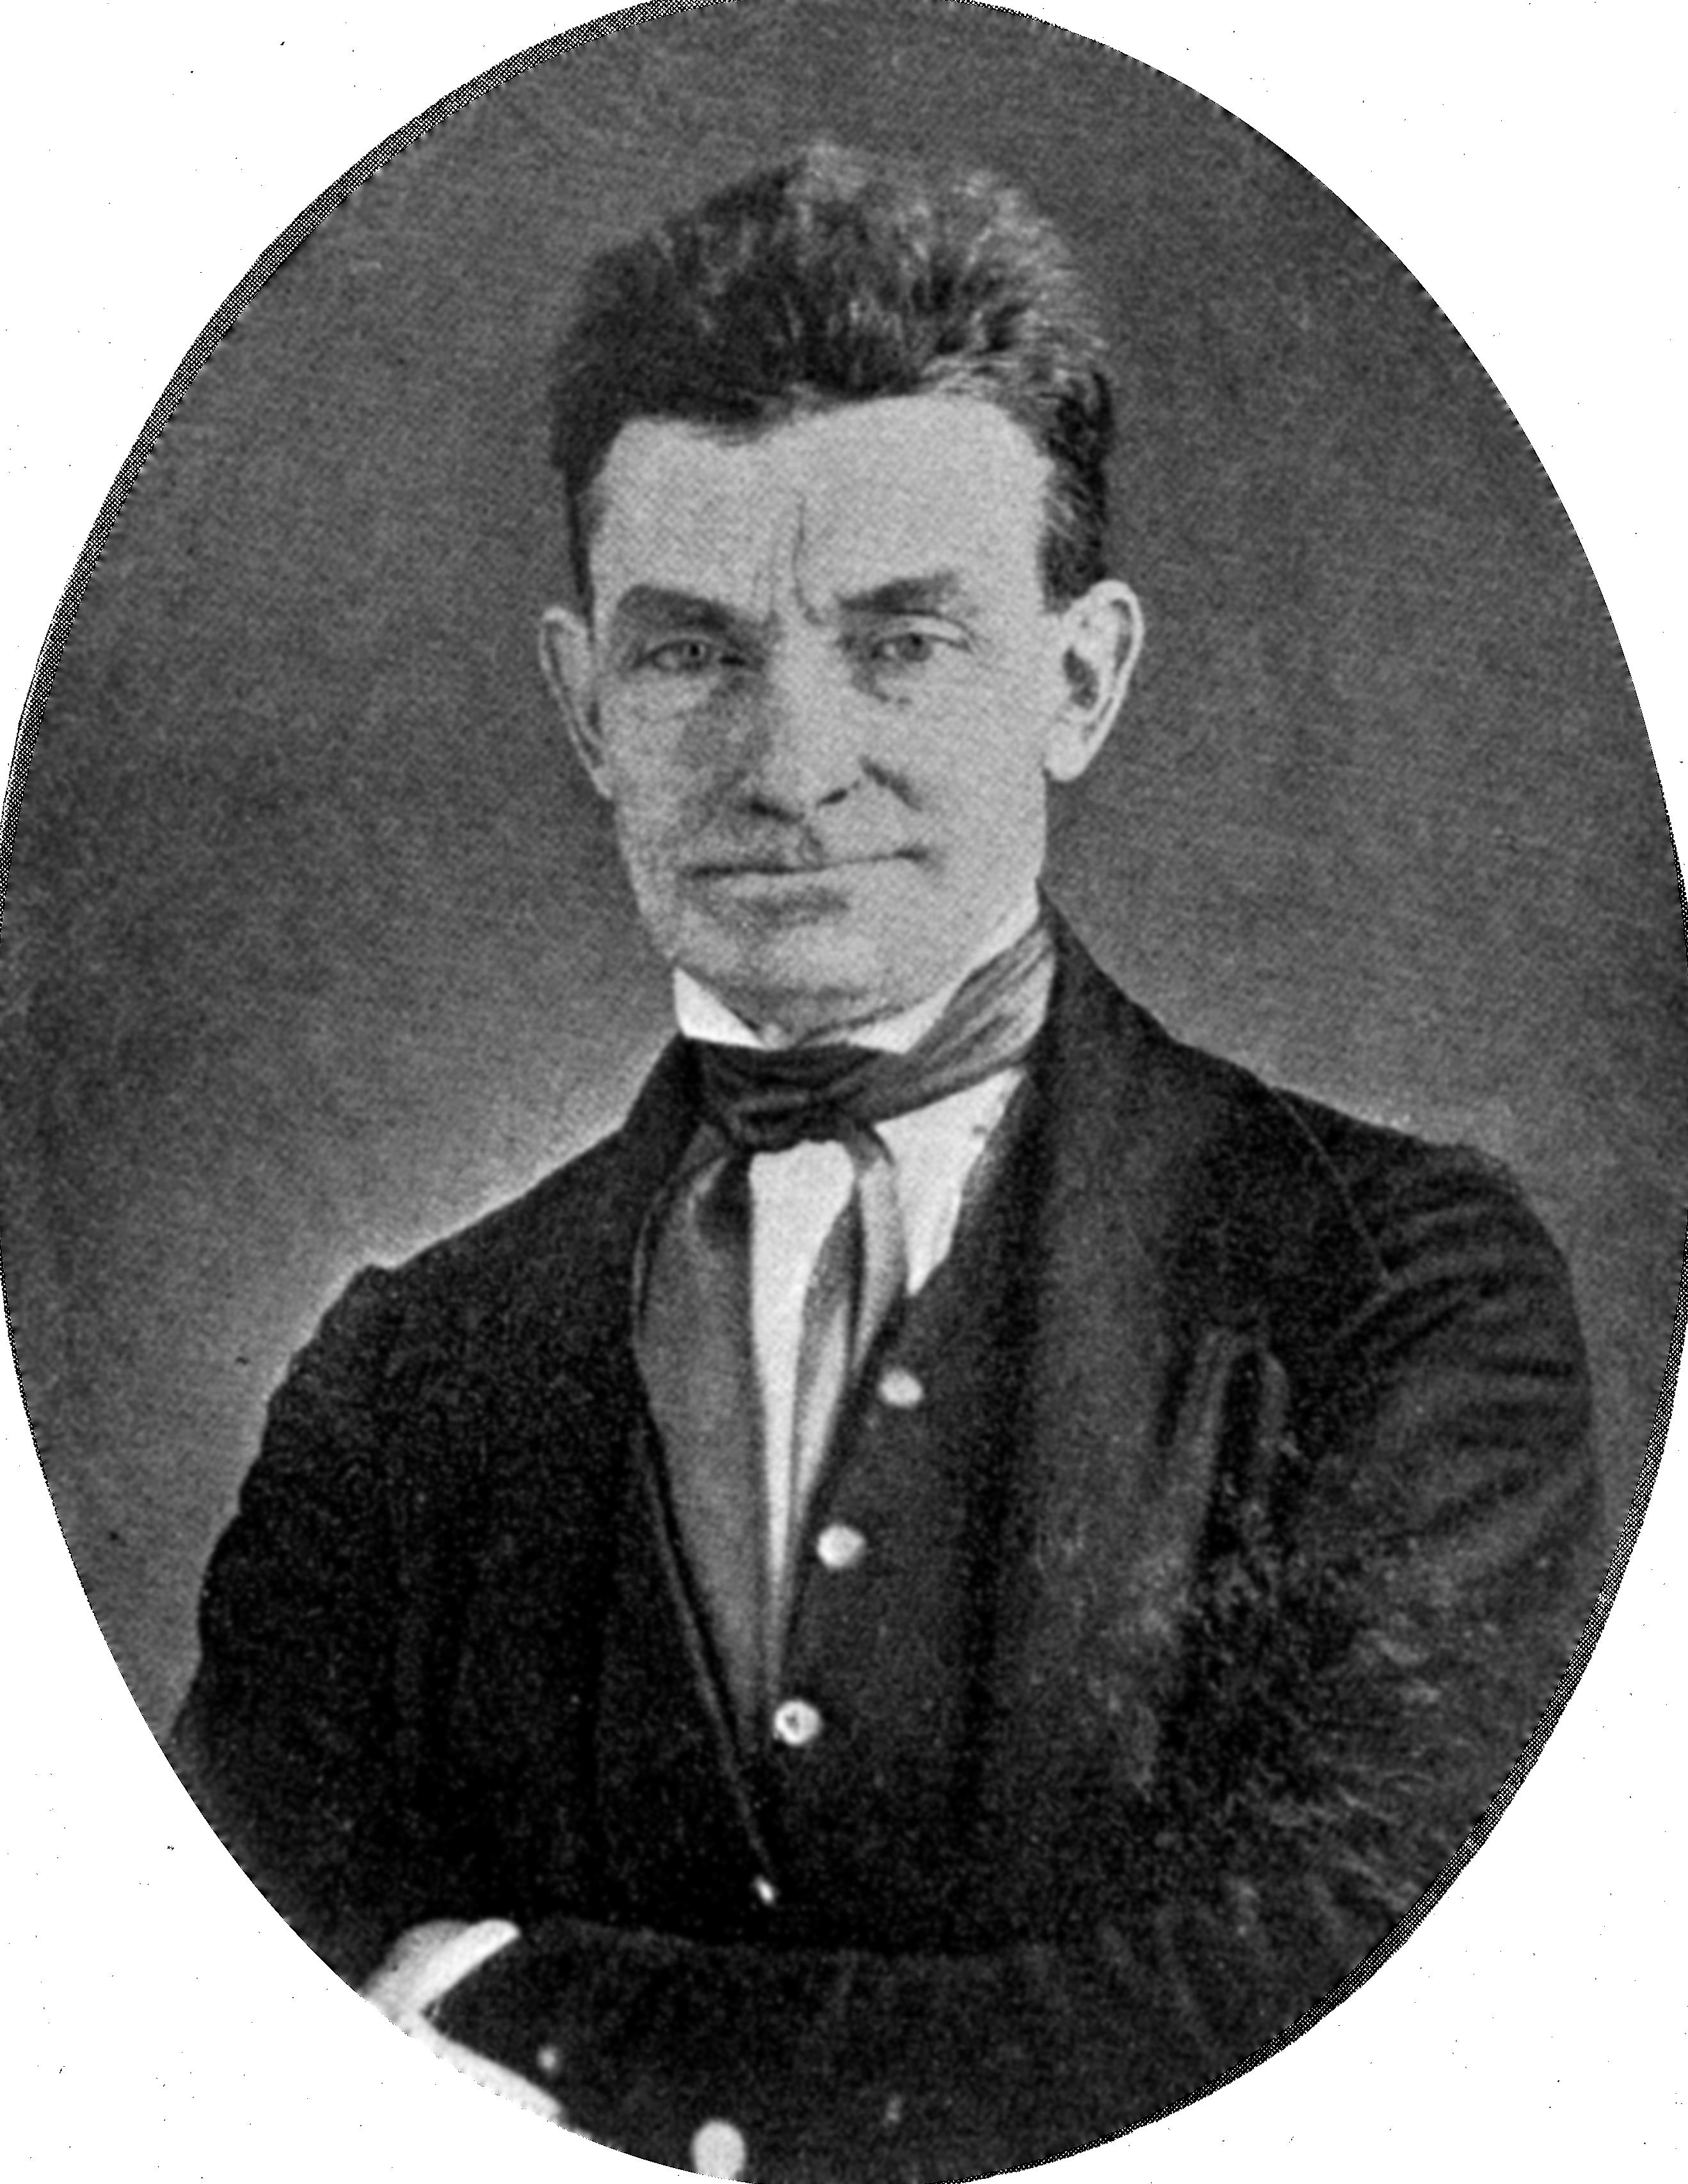 Jan Ingenhousz U >> File:John Brown by Augustus Washington, 1846-47 reprint.png - Wikimedia Commons